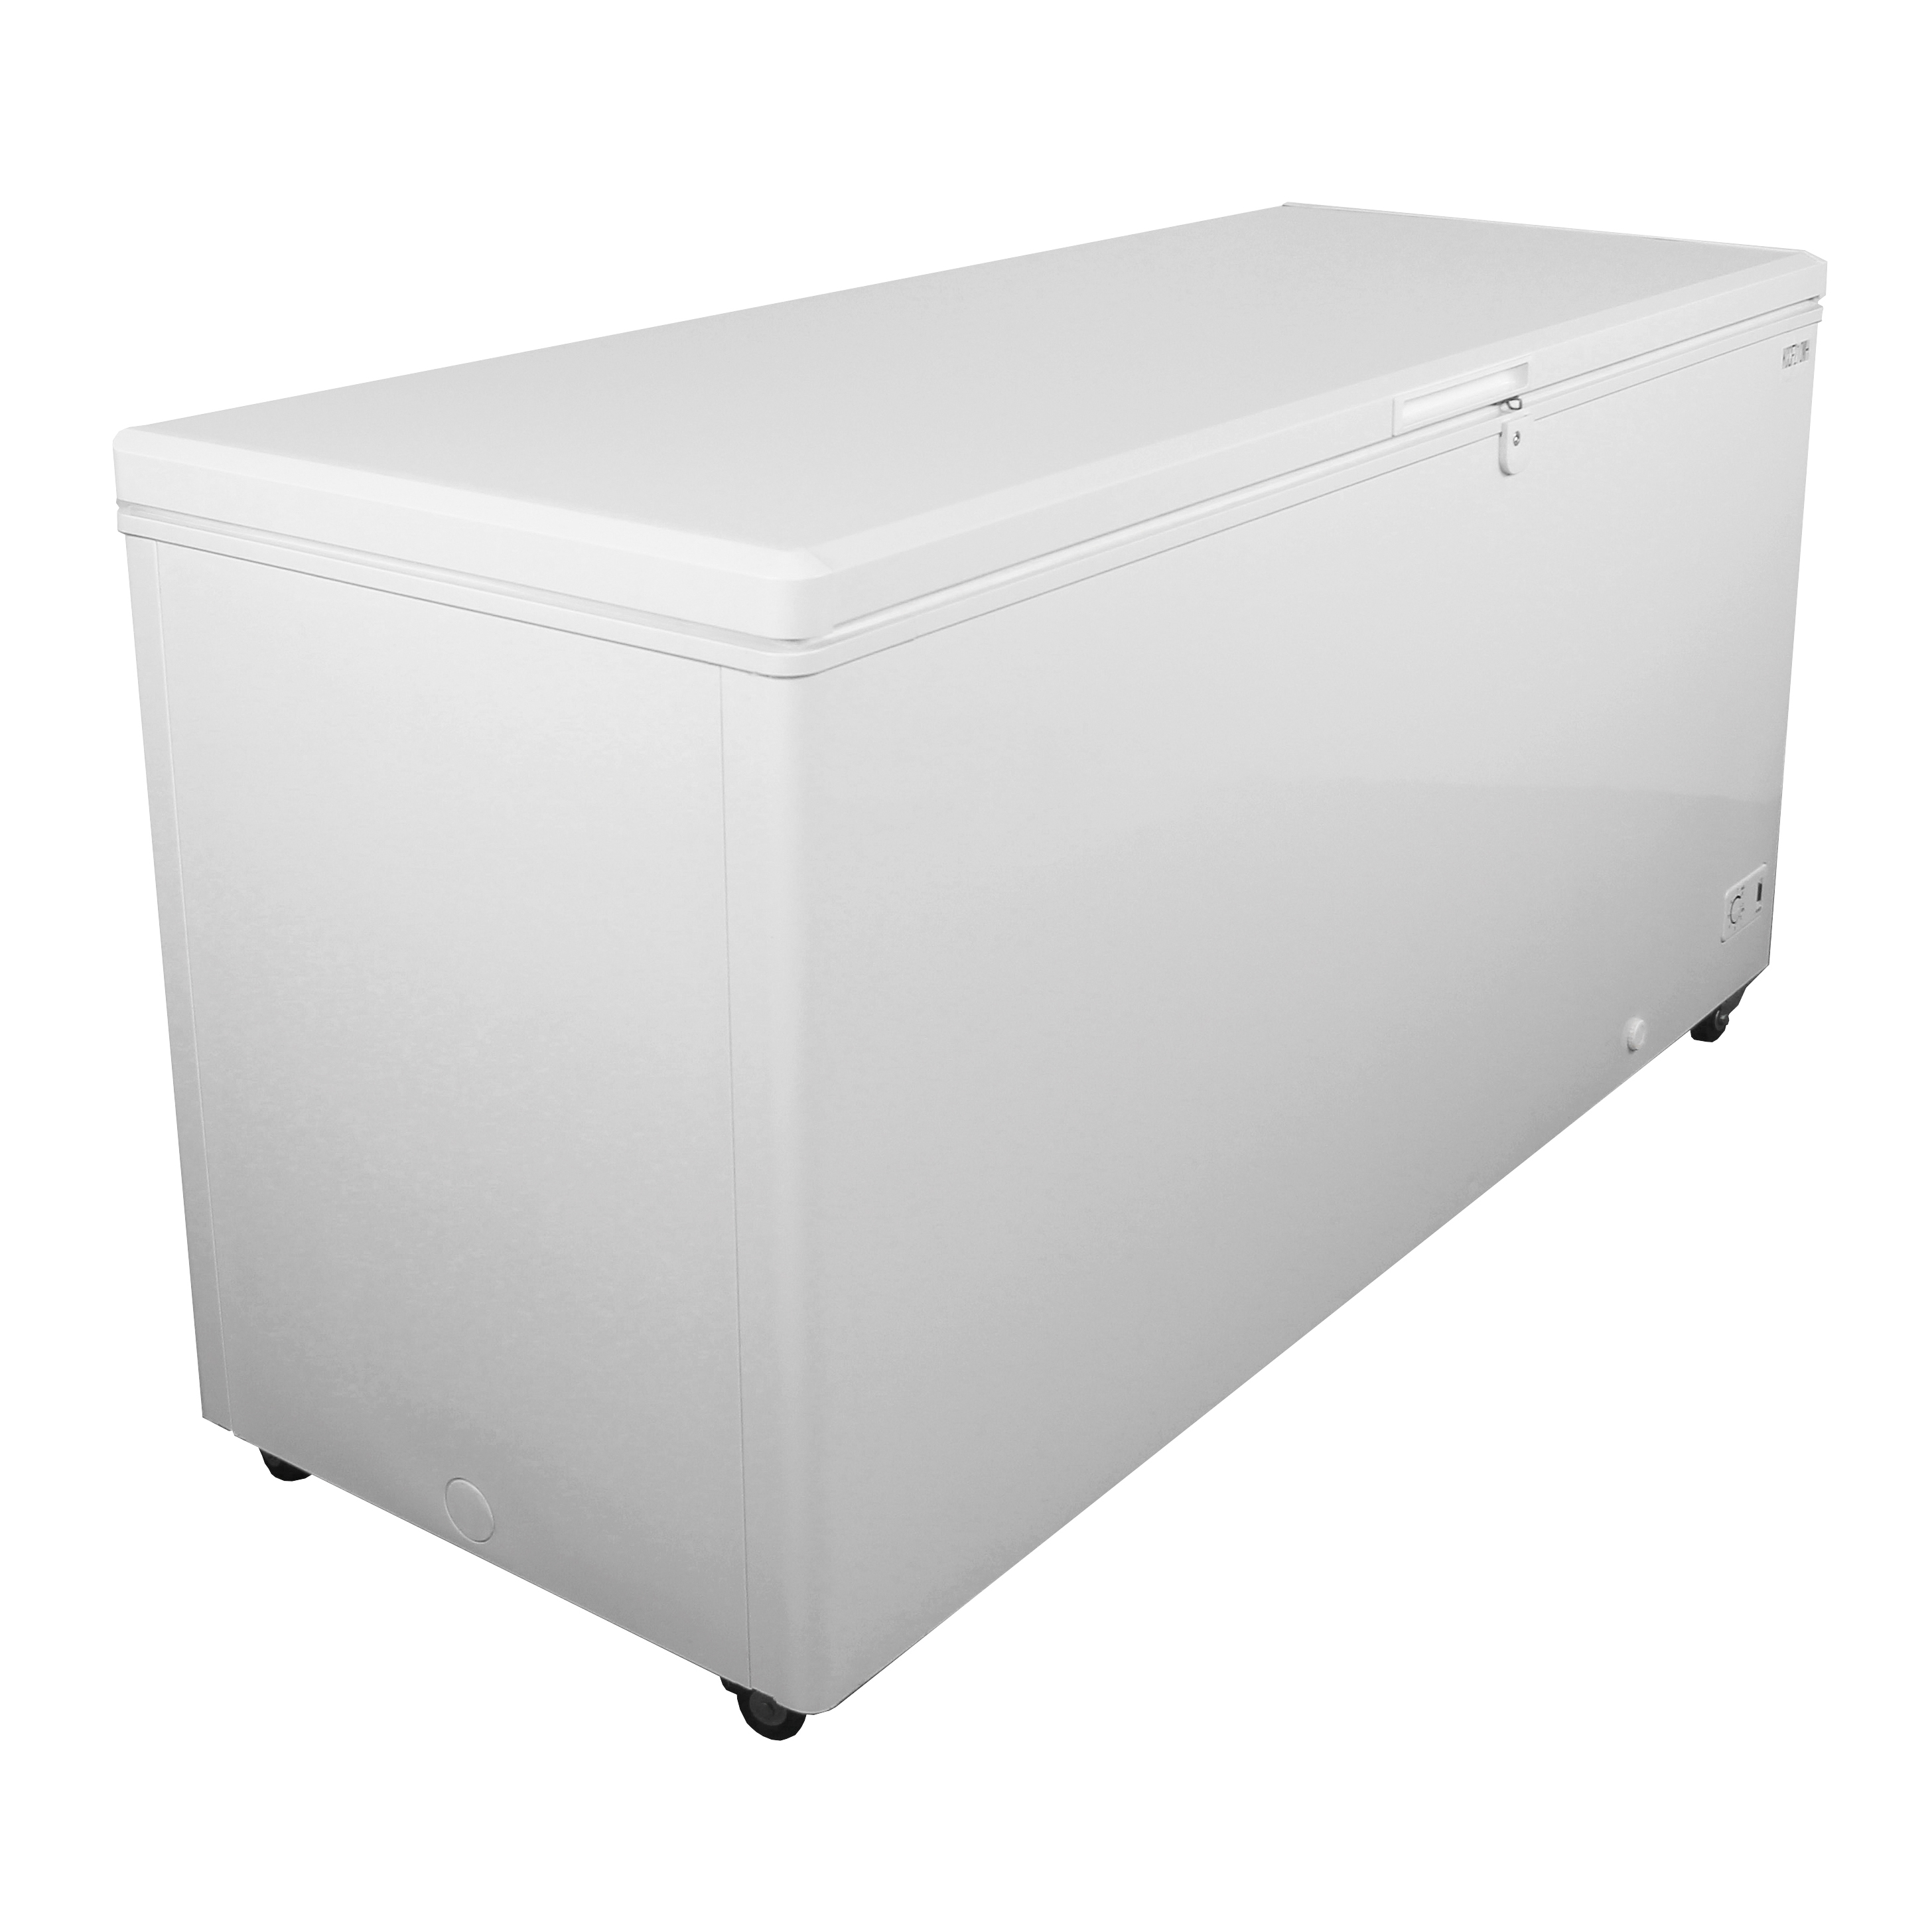 Kelvinator Commercial KCCF210WH chest freezer